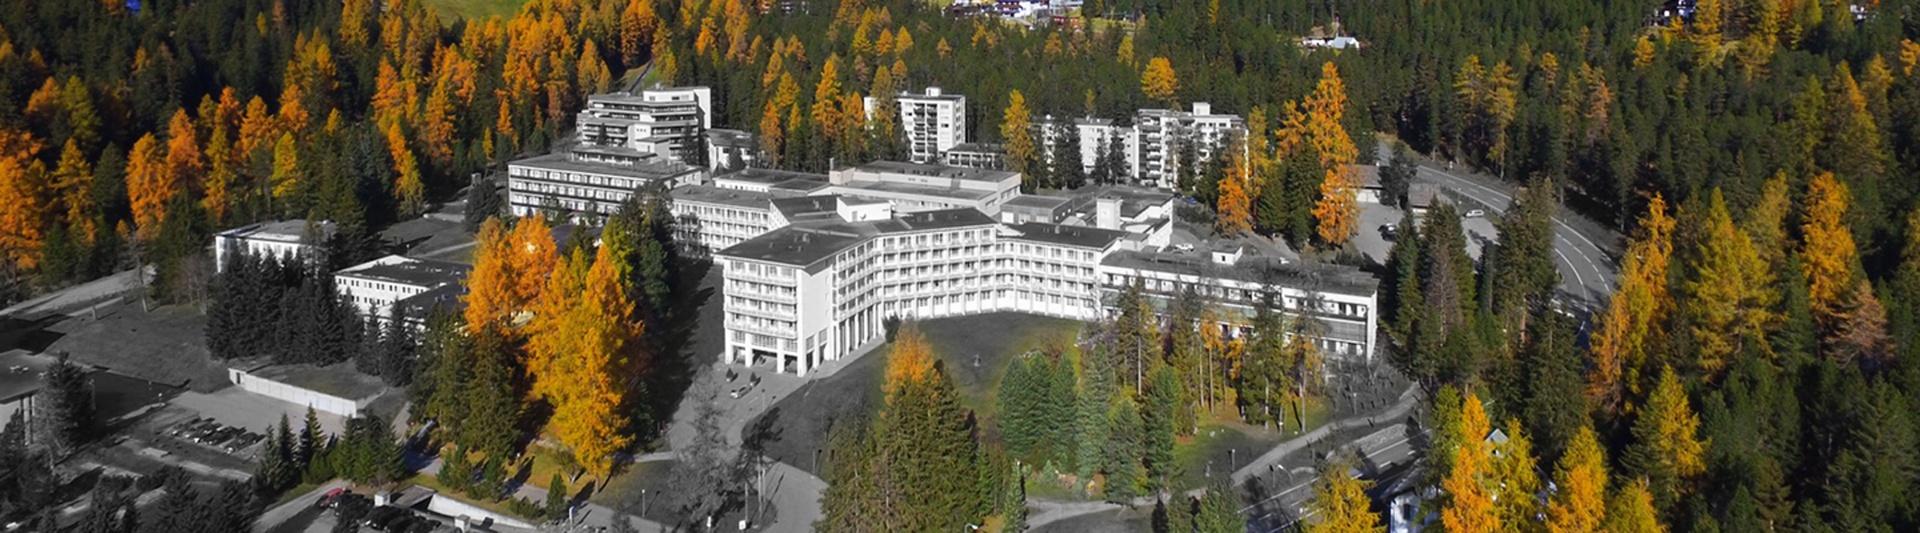 Vogelbild Hochgebirgsklinik Davos © unklar; Google